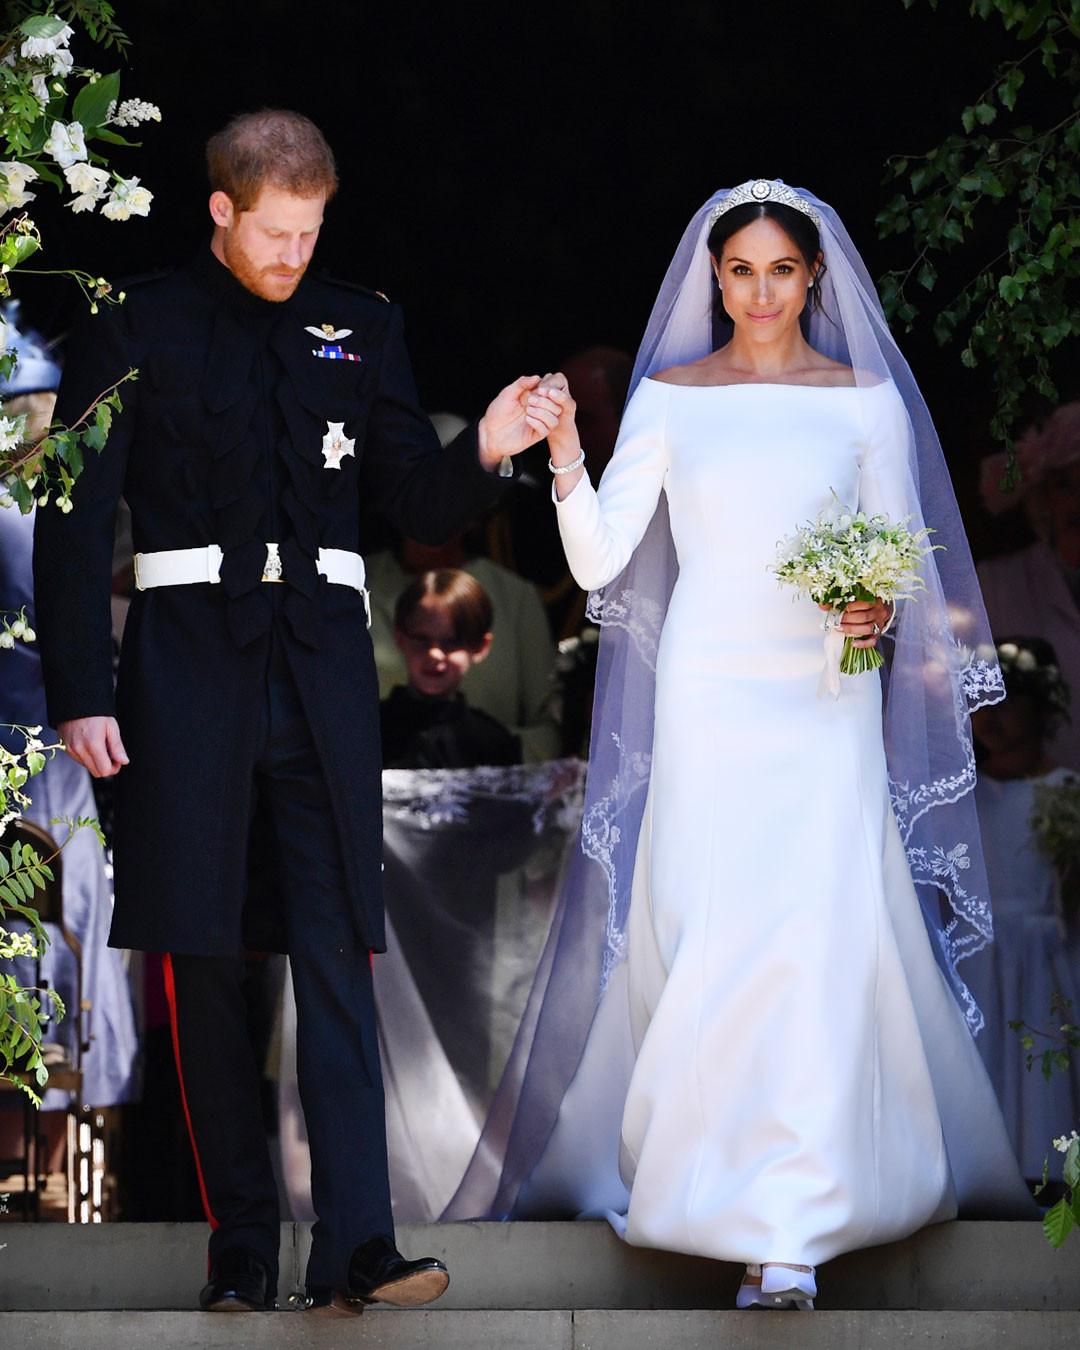 ESC: Prince Harry, Meghan Markle, Highs